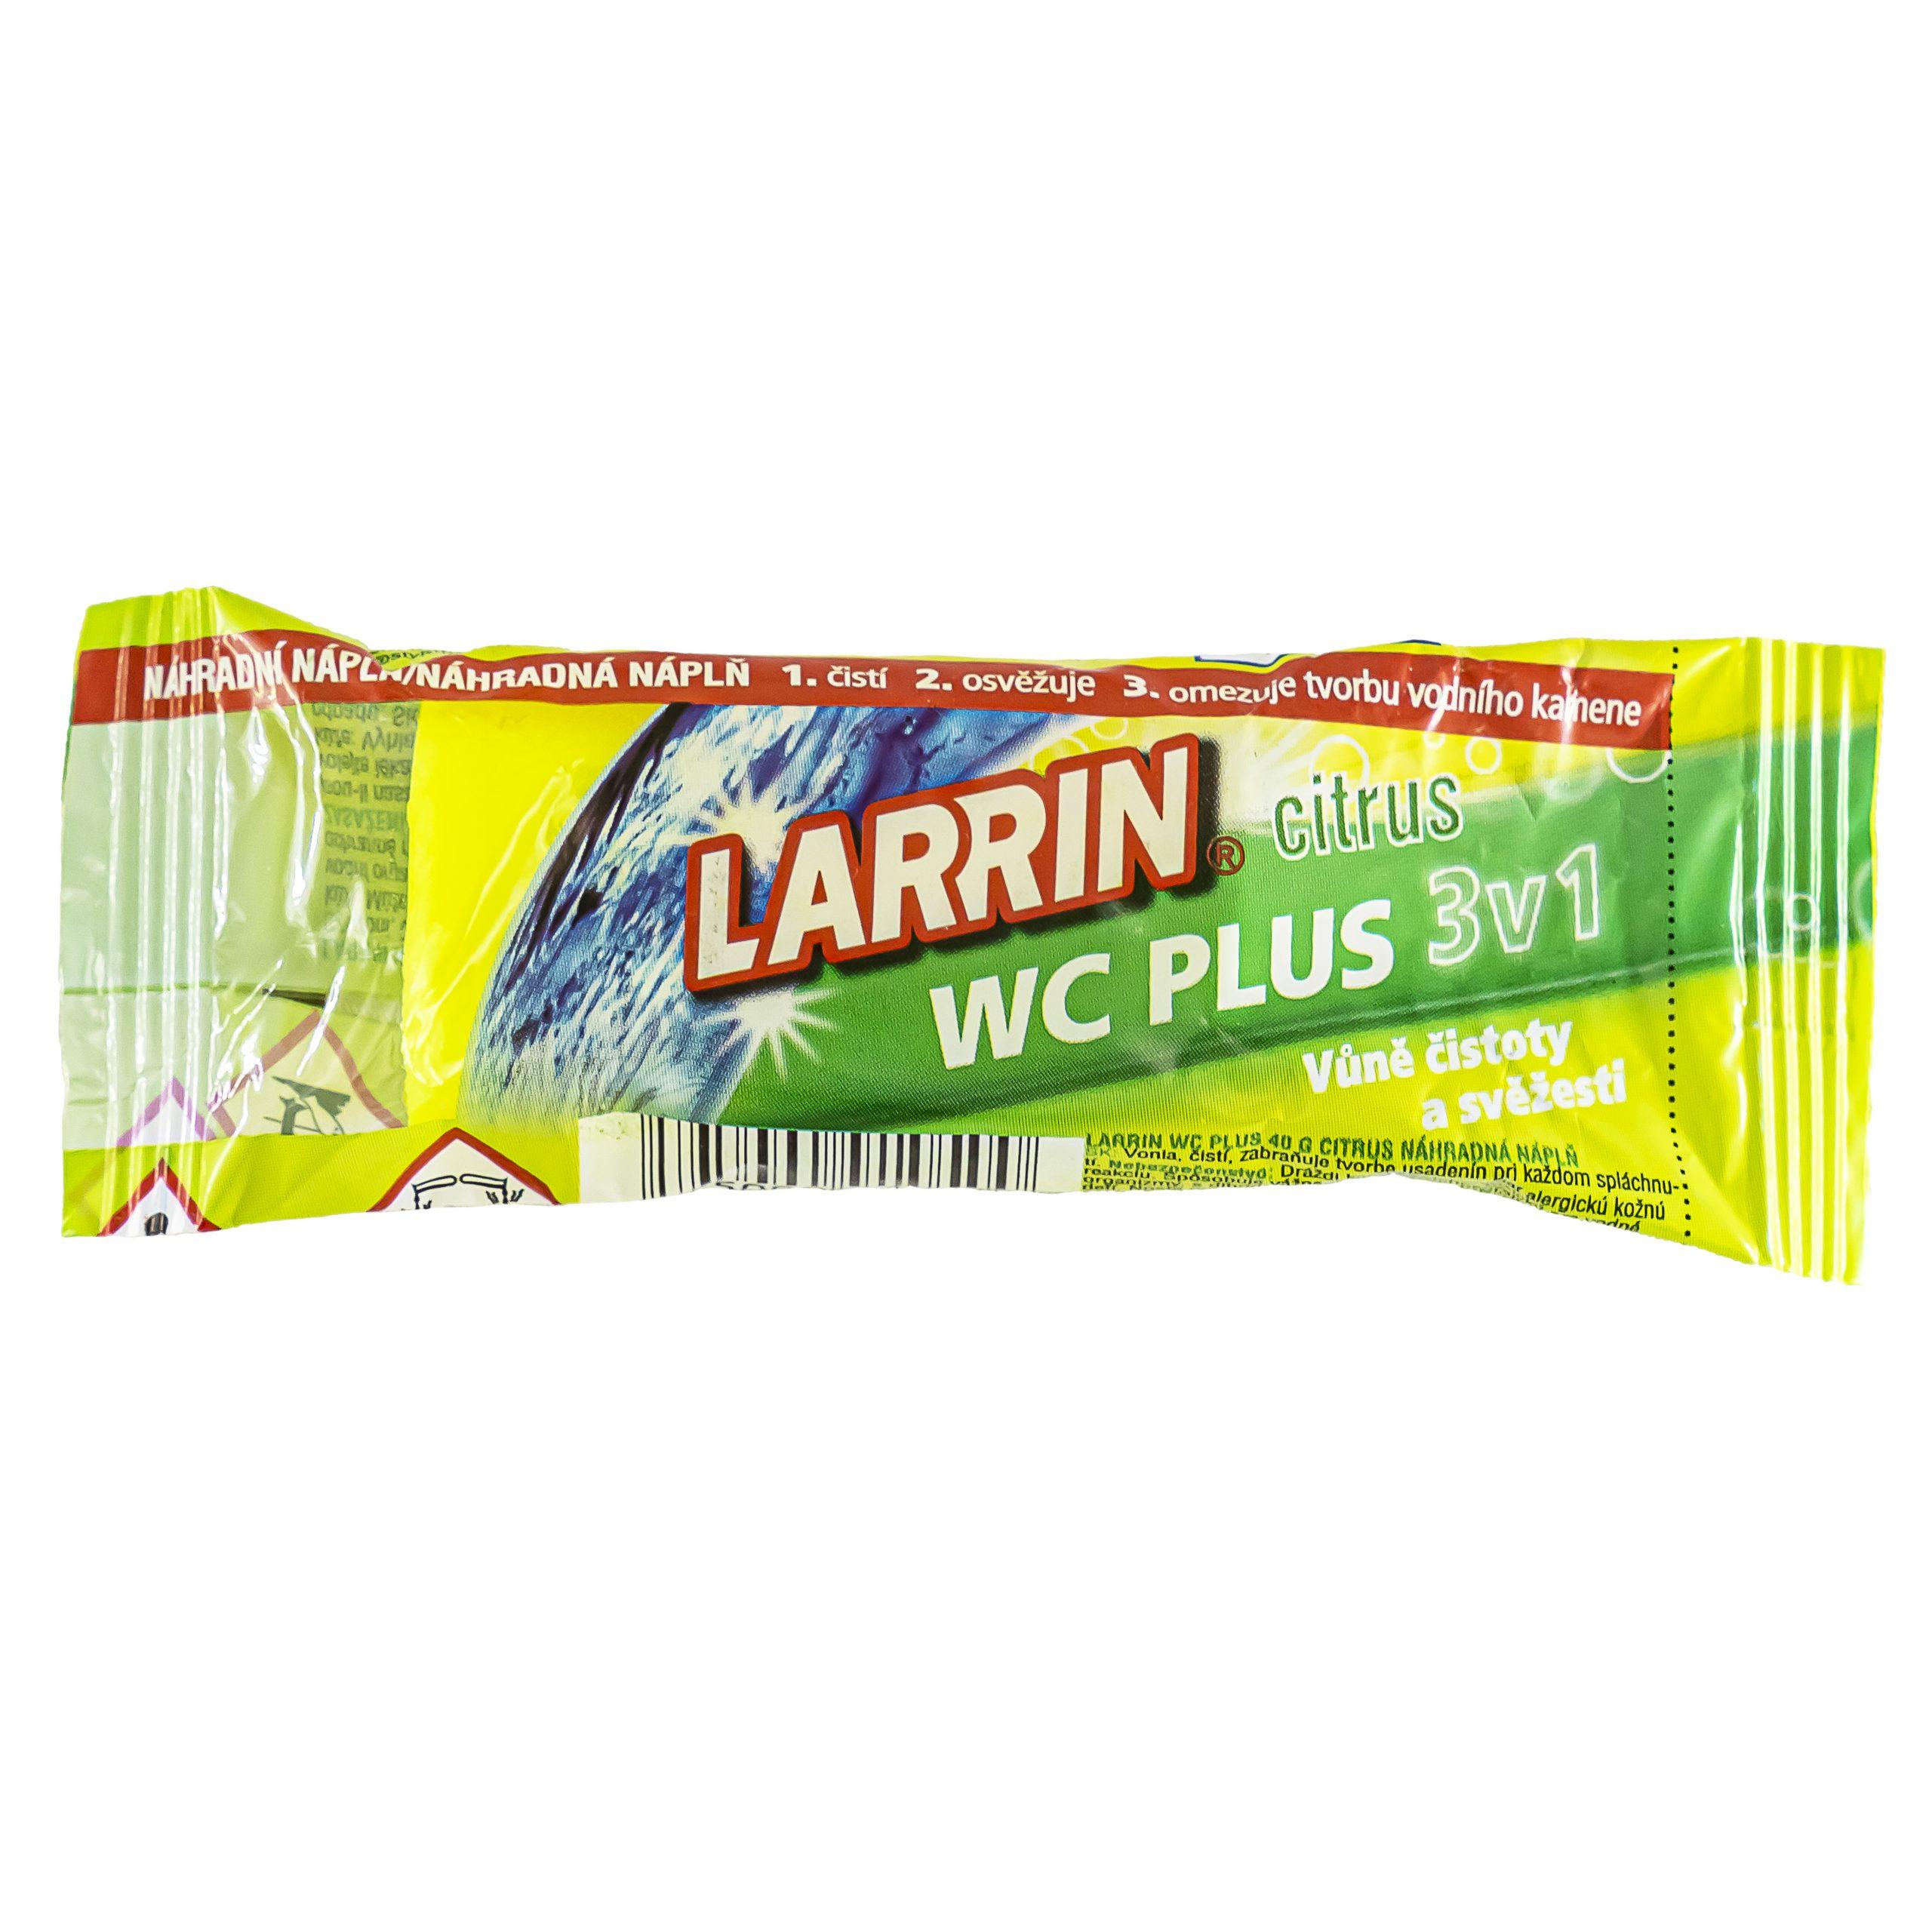 Larrin WC Plus citrus 3v1